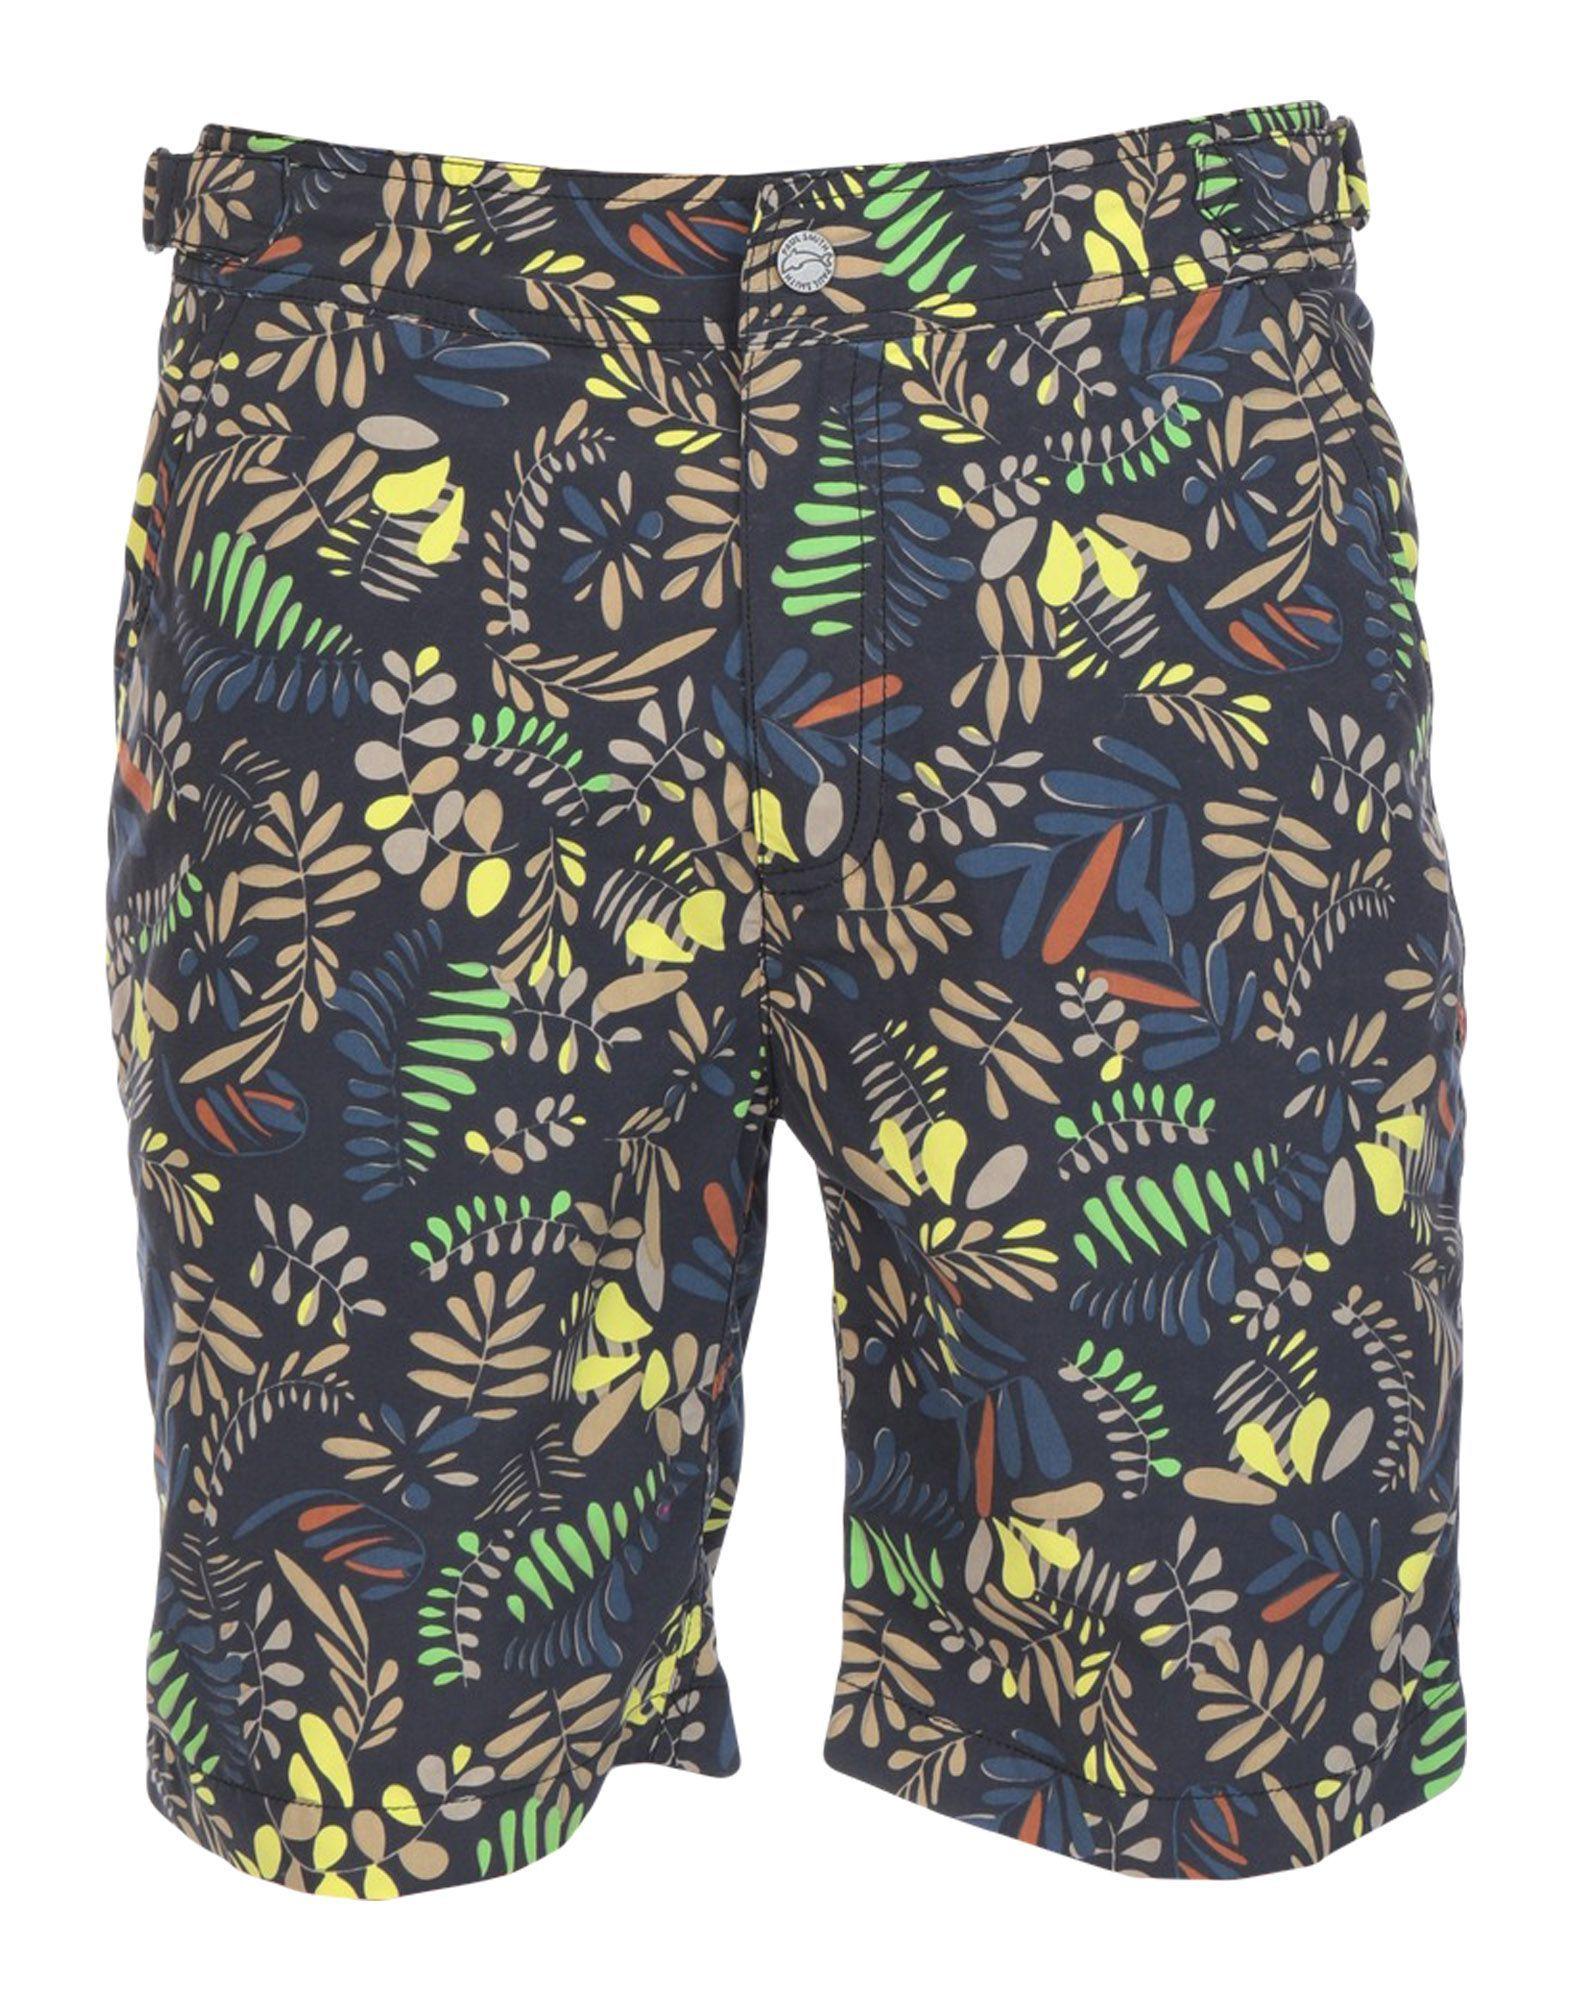 2bfc18565c PRADA PRADA GEOMETRIC PRINT SWIM SHORTS - BLUE. #prada #cloth   Prada in  2019   Swim shorts, Prada, Shorts